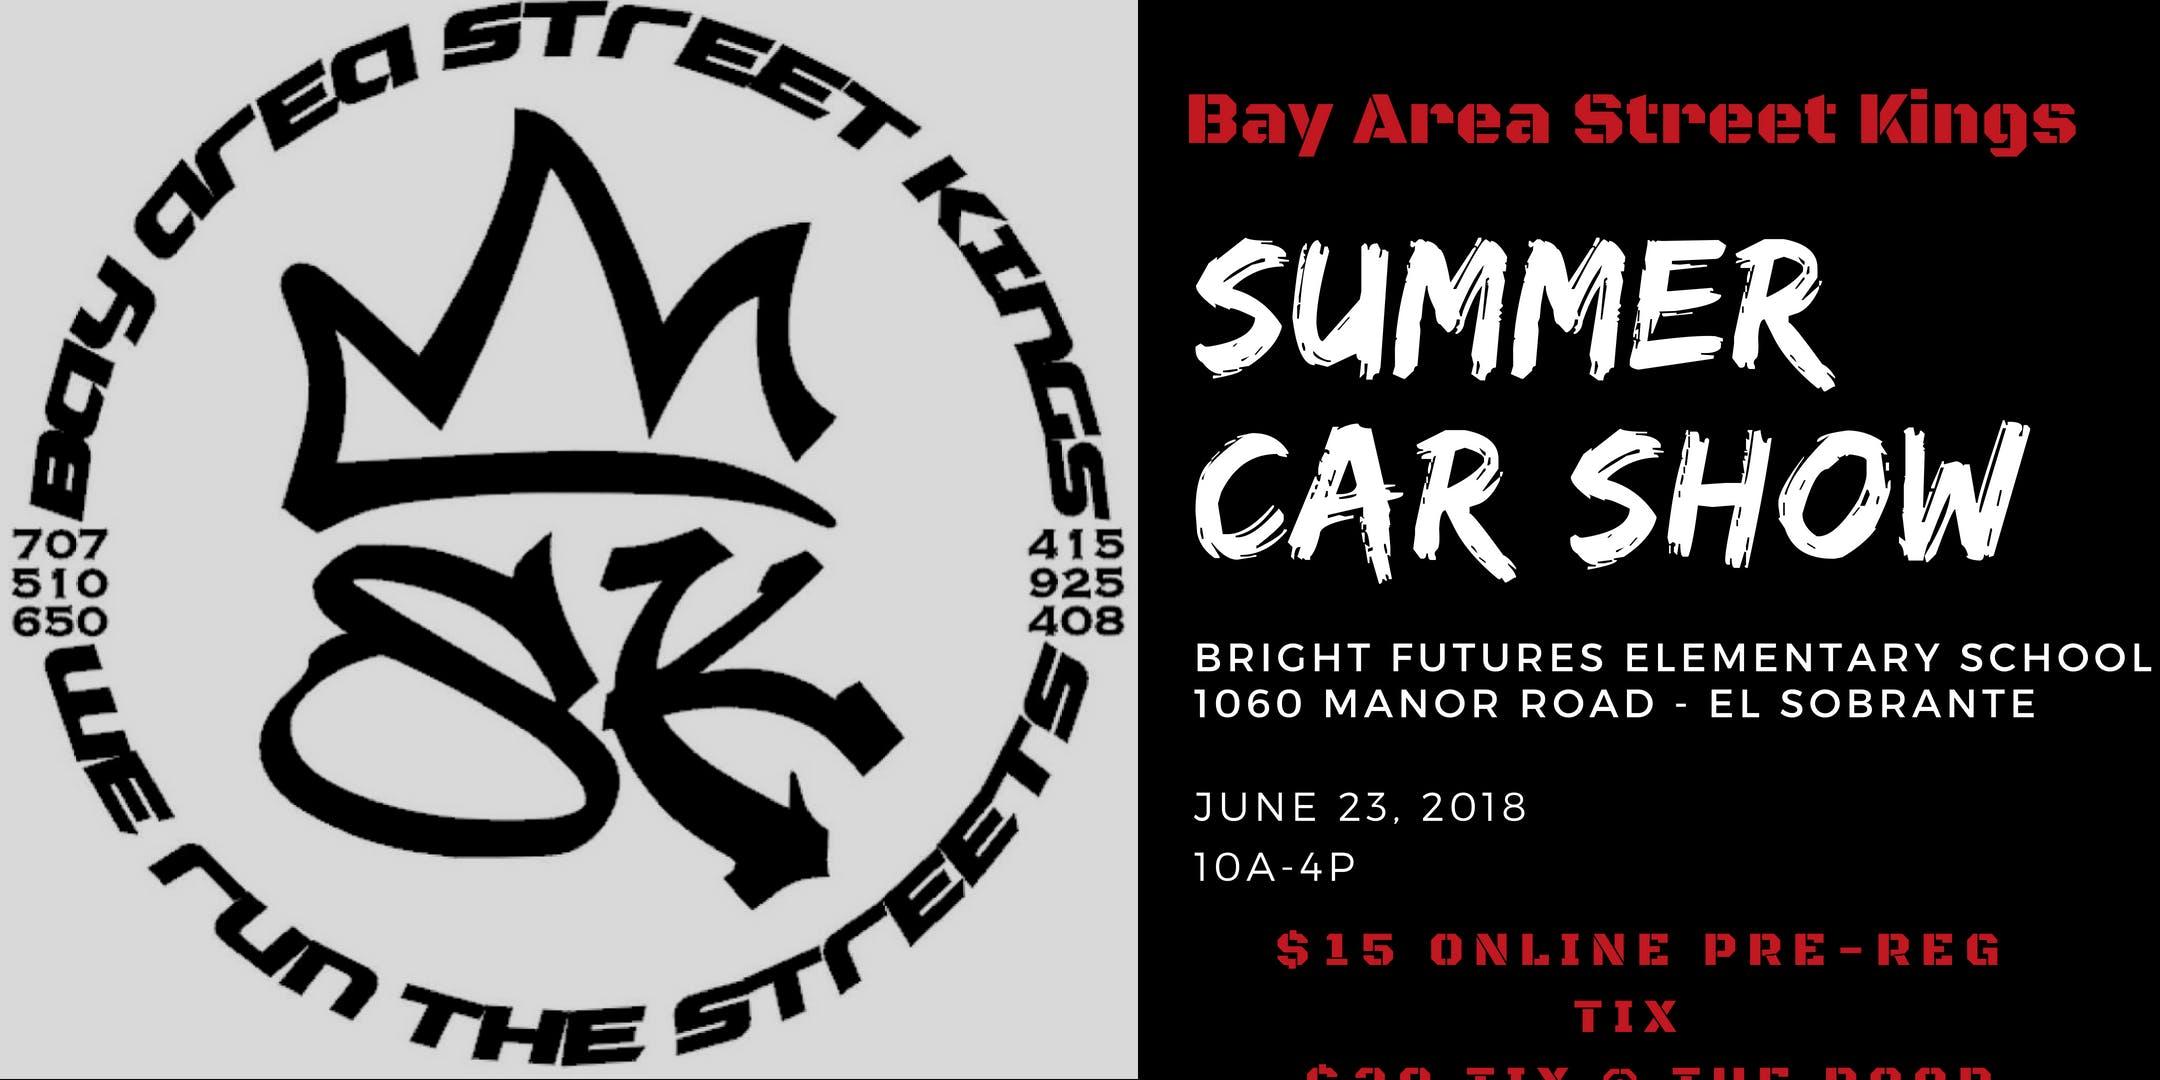 Bay Area Street Kings SUMMER CAR SHOW JUN - Bay area car shows this weekend